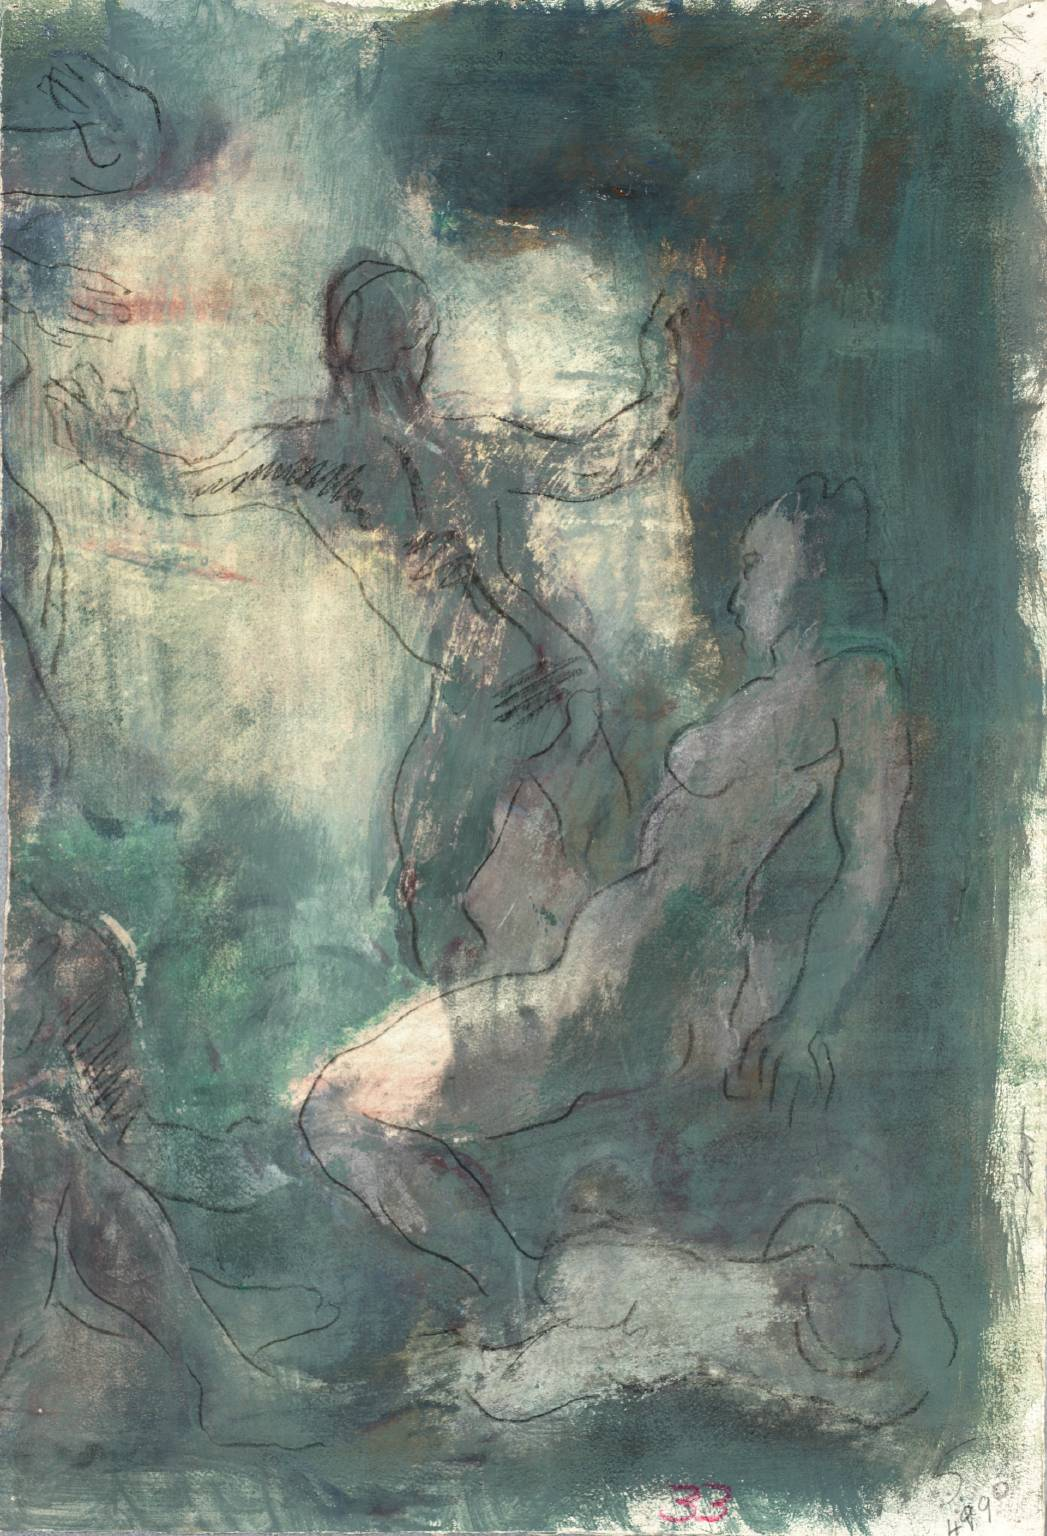 Nude Figures in a Room, 1938